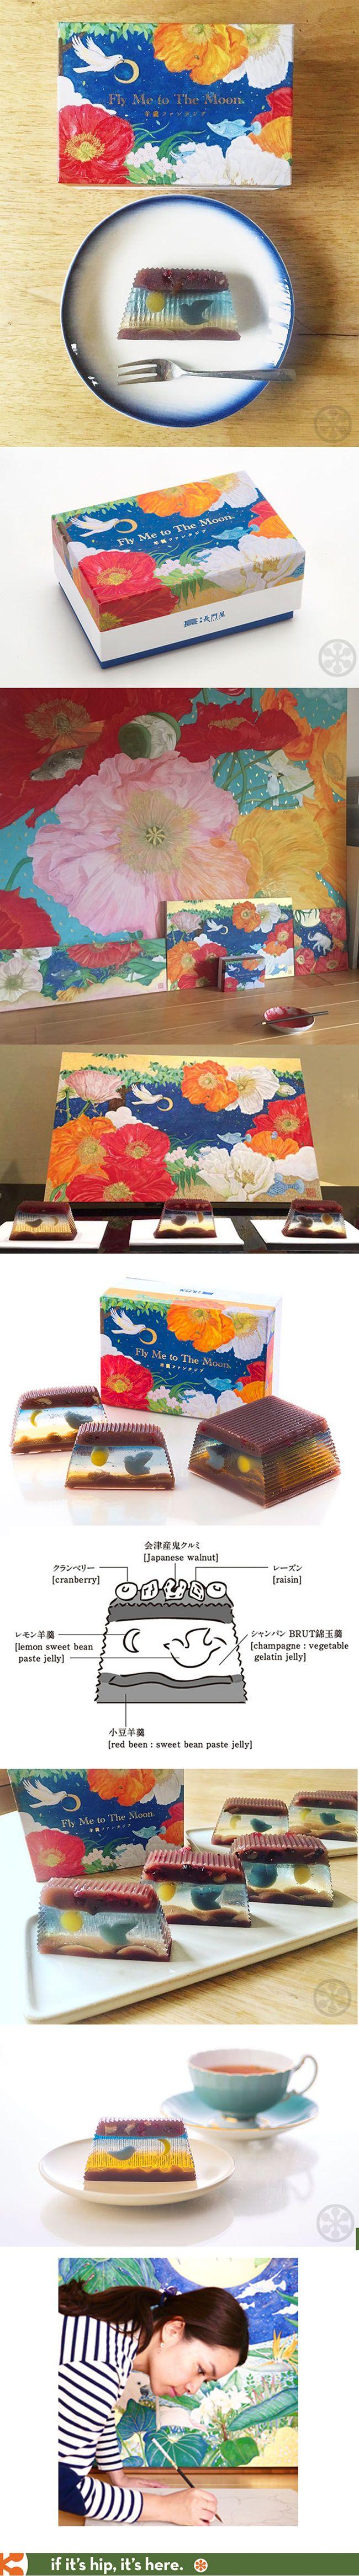 This stunning edible art dessert has pretty packaging to match by Japanese painter Masuda Reika.